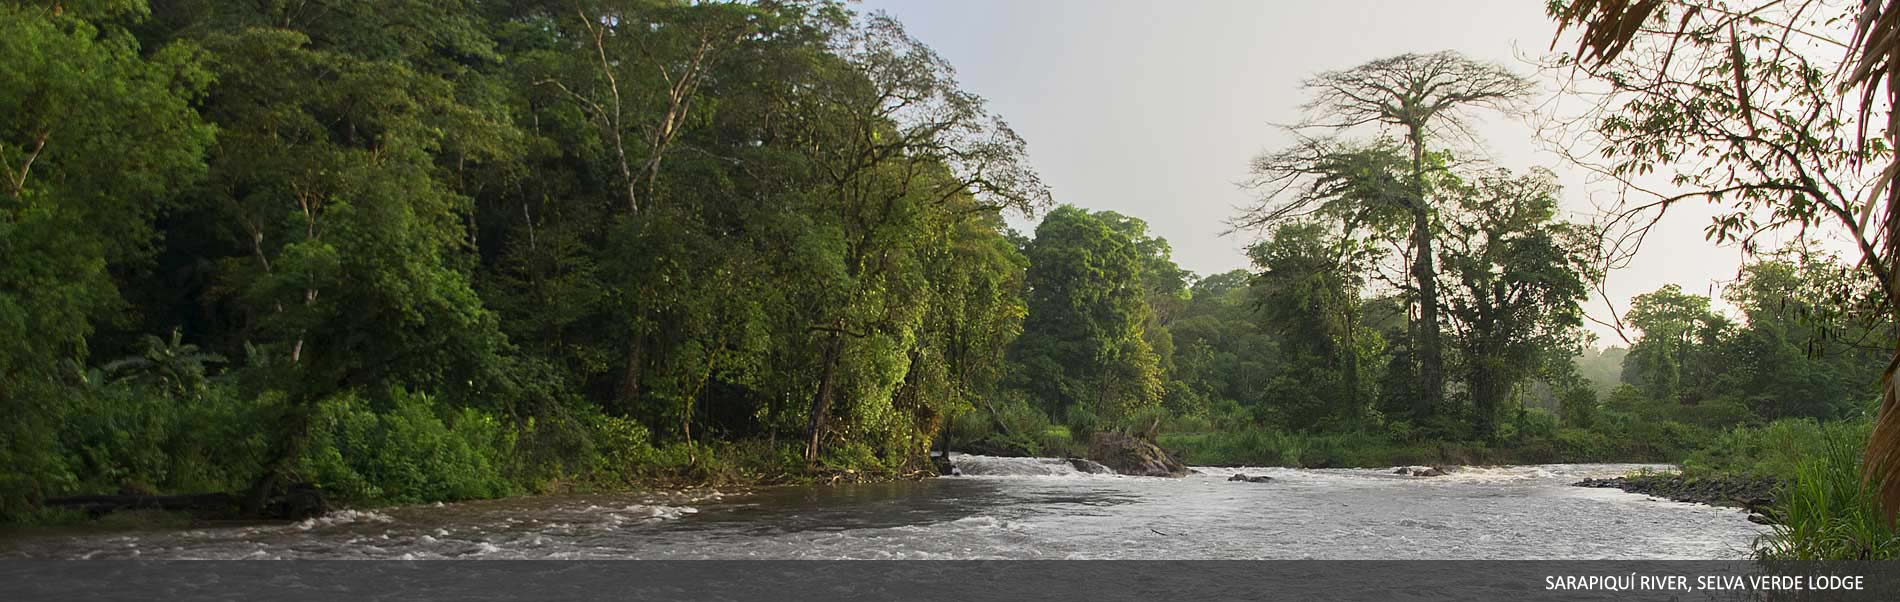 selvaverde-costarica-07.jpg